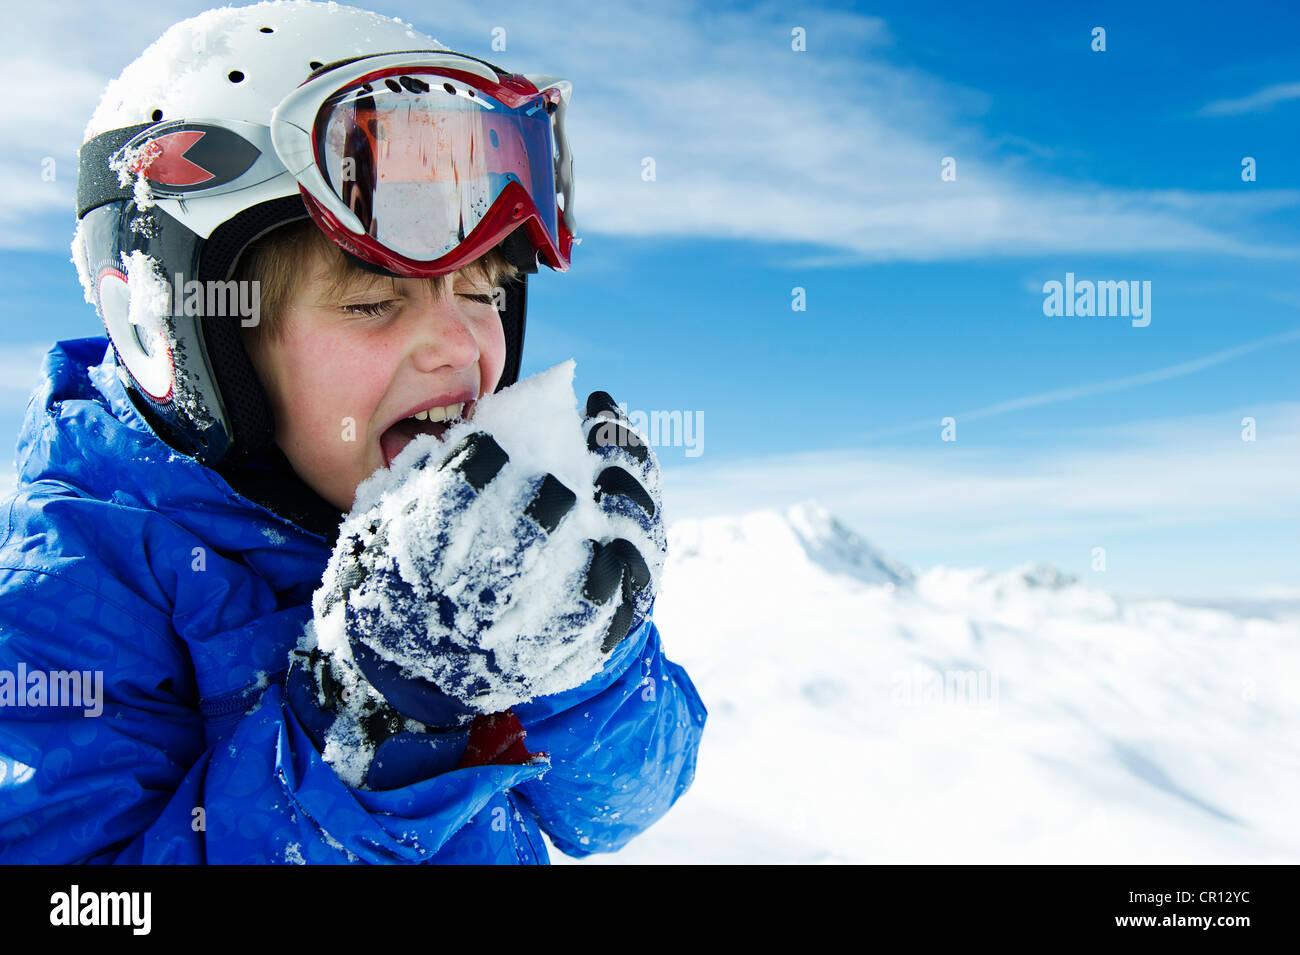 Boy tasting snowball on mountain - Stock Image